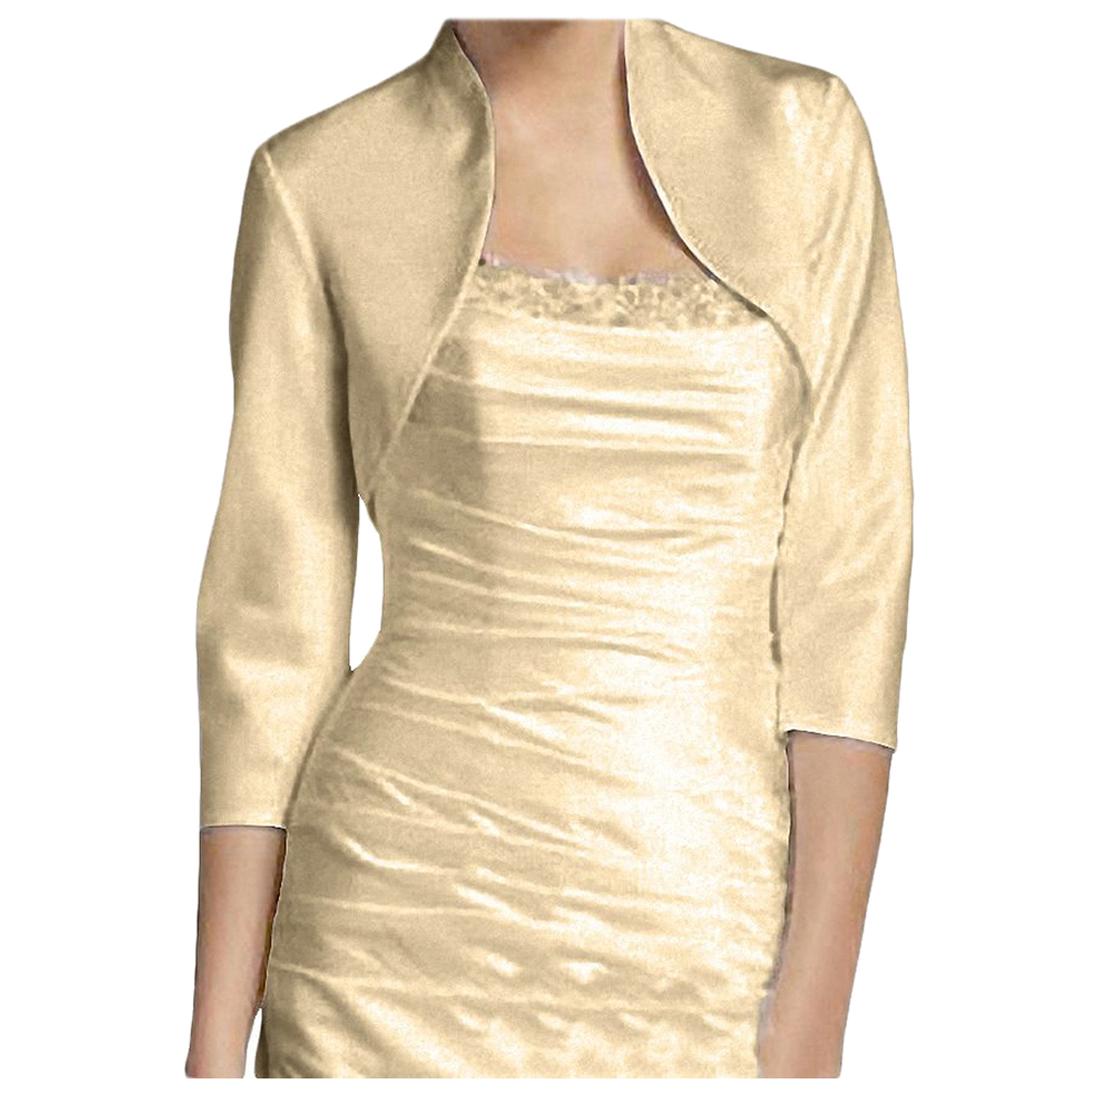 Short sleeve jackets for women